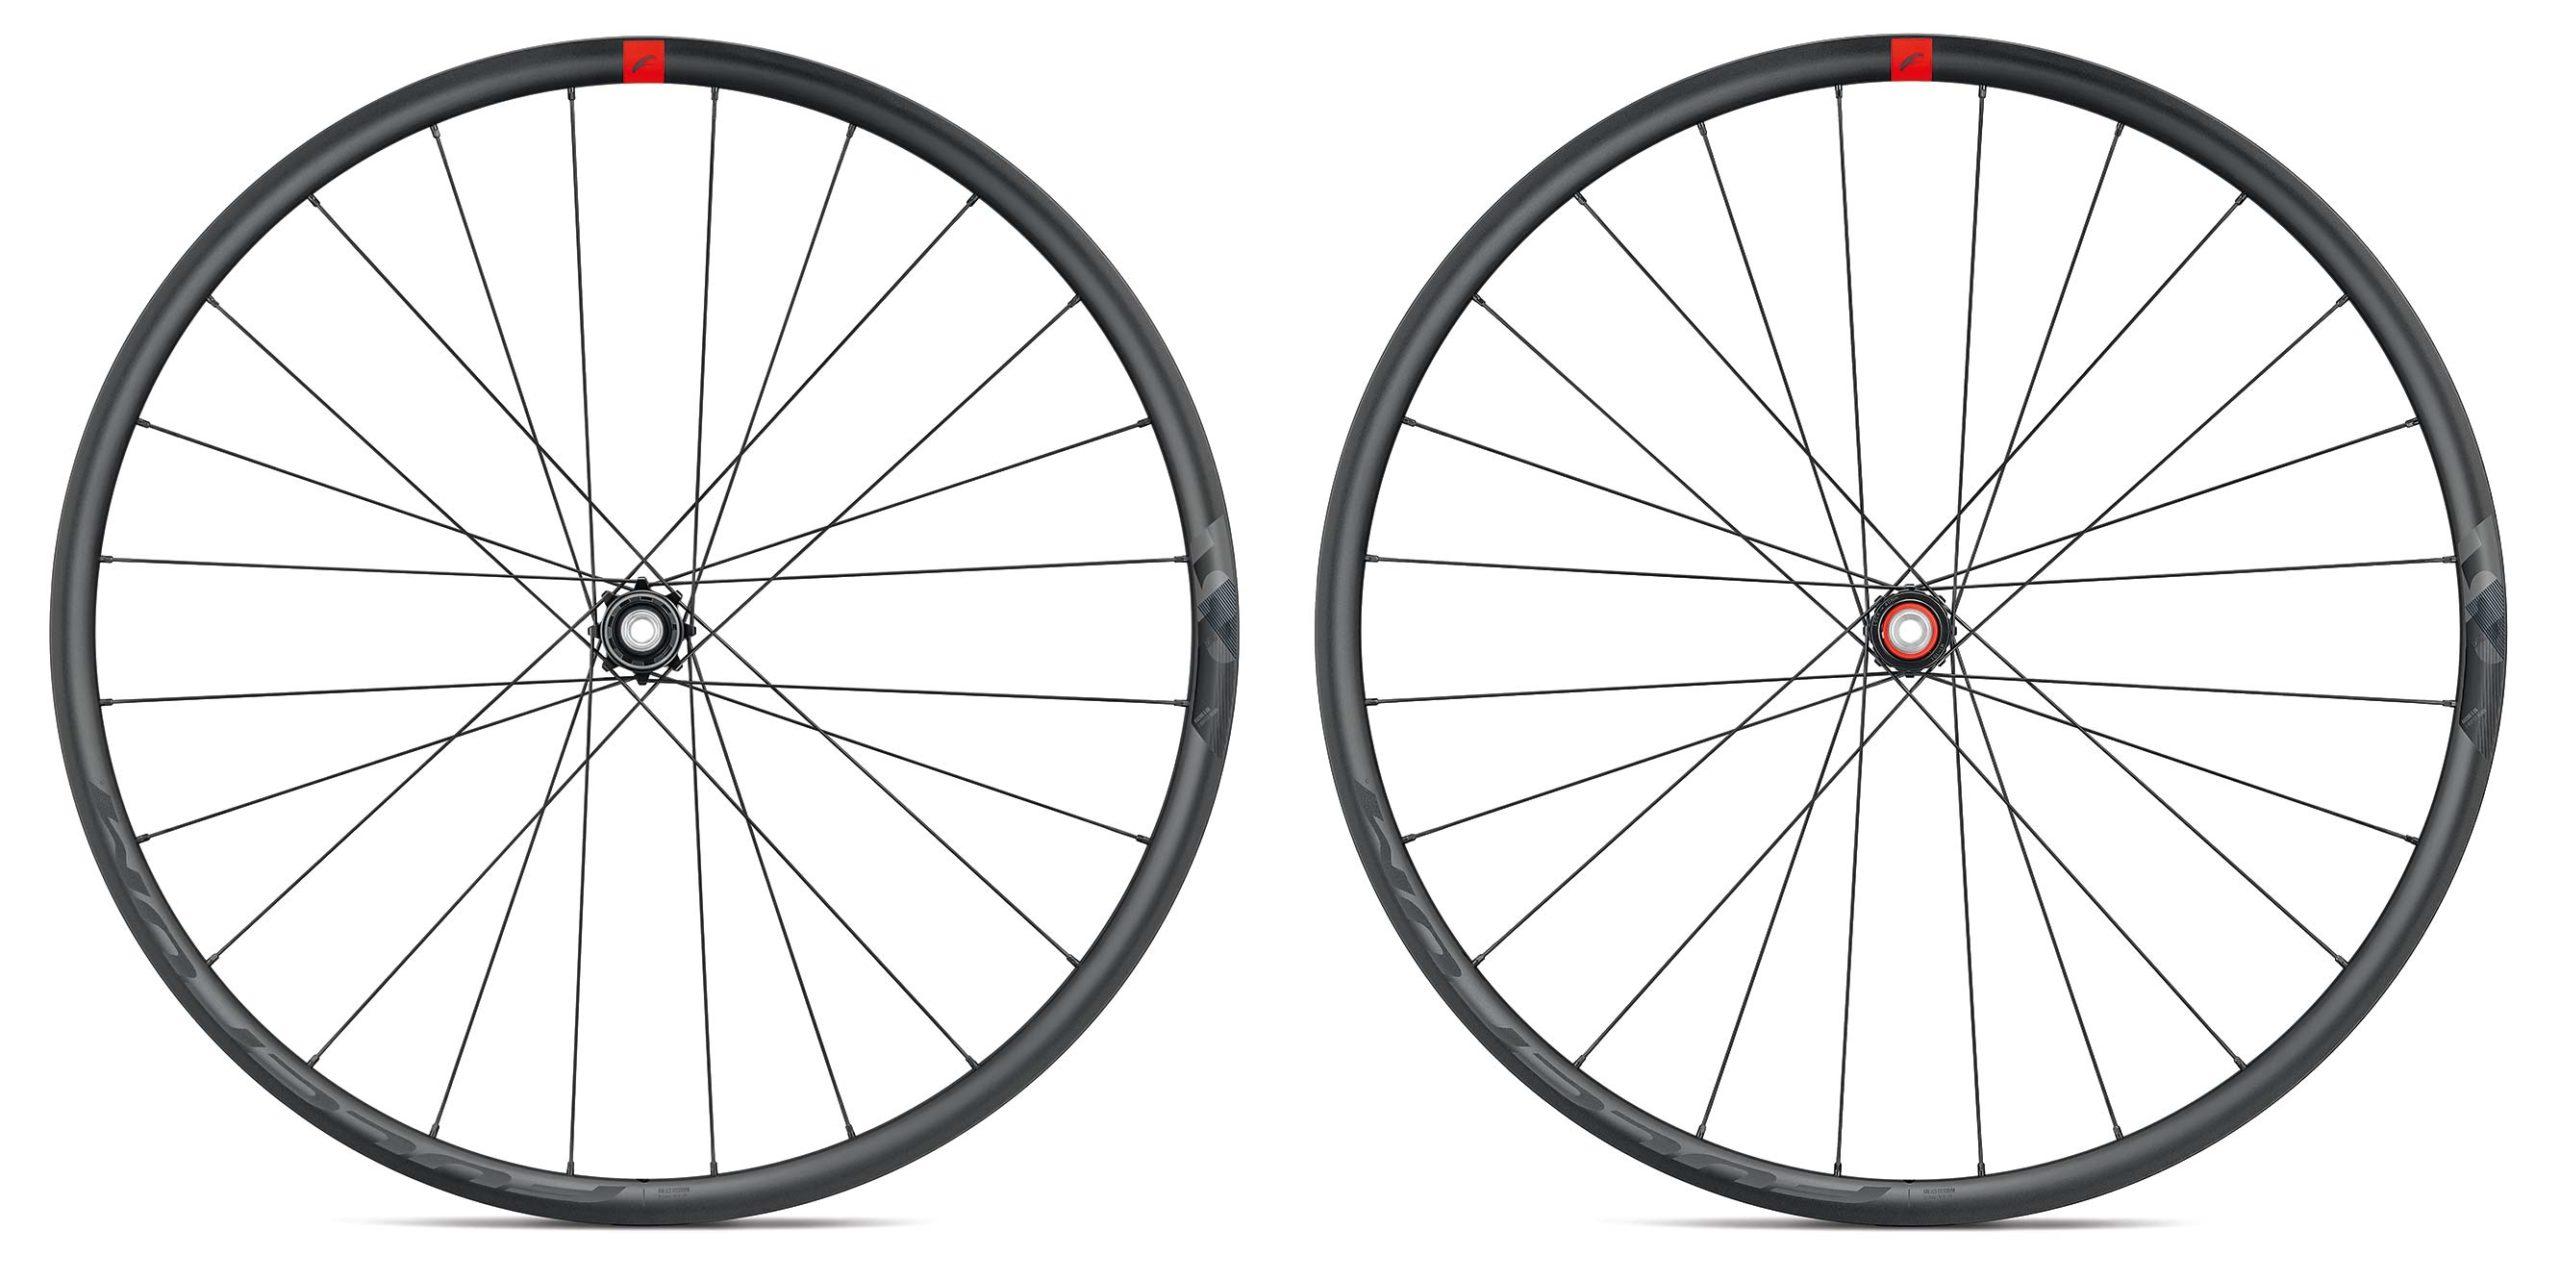 2022 Fulcrum Racing 4 5 6 DB alloy road wheels, affordable aluminum tubeless gravel all road bike disc brake wheelsets